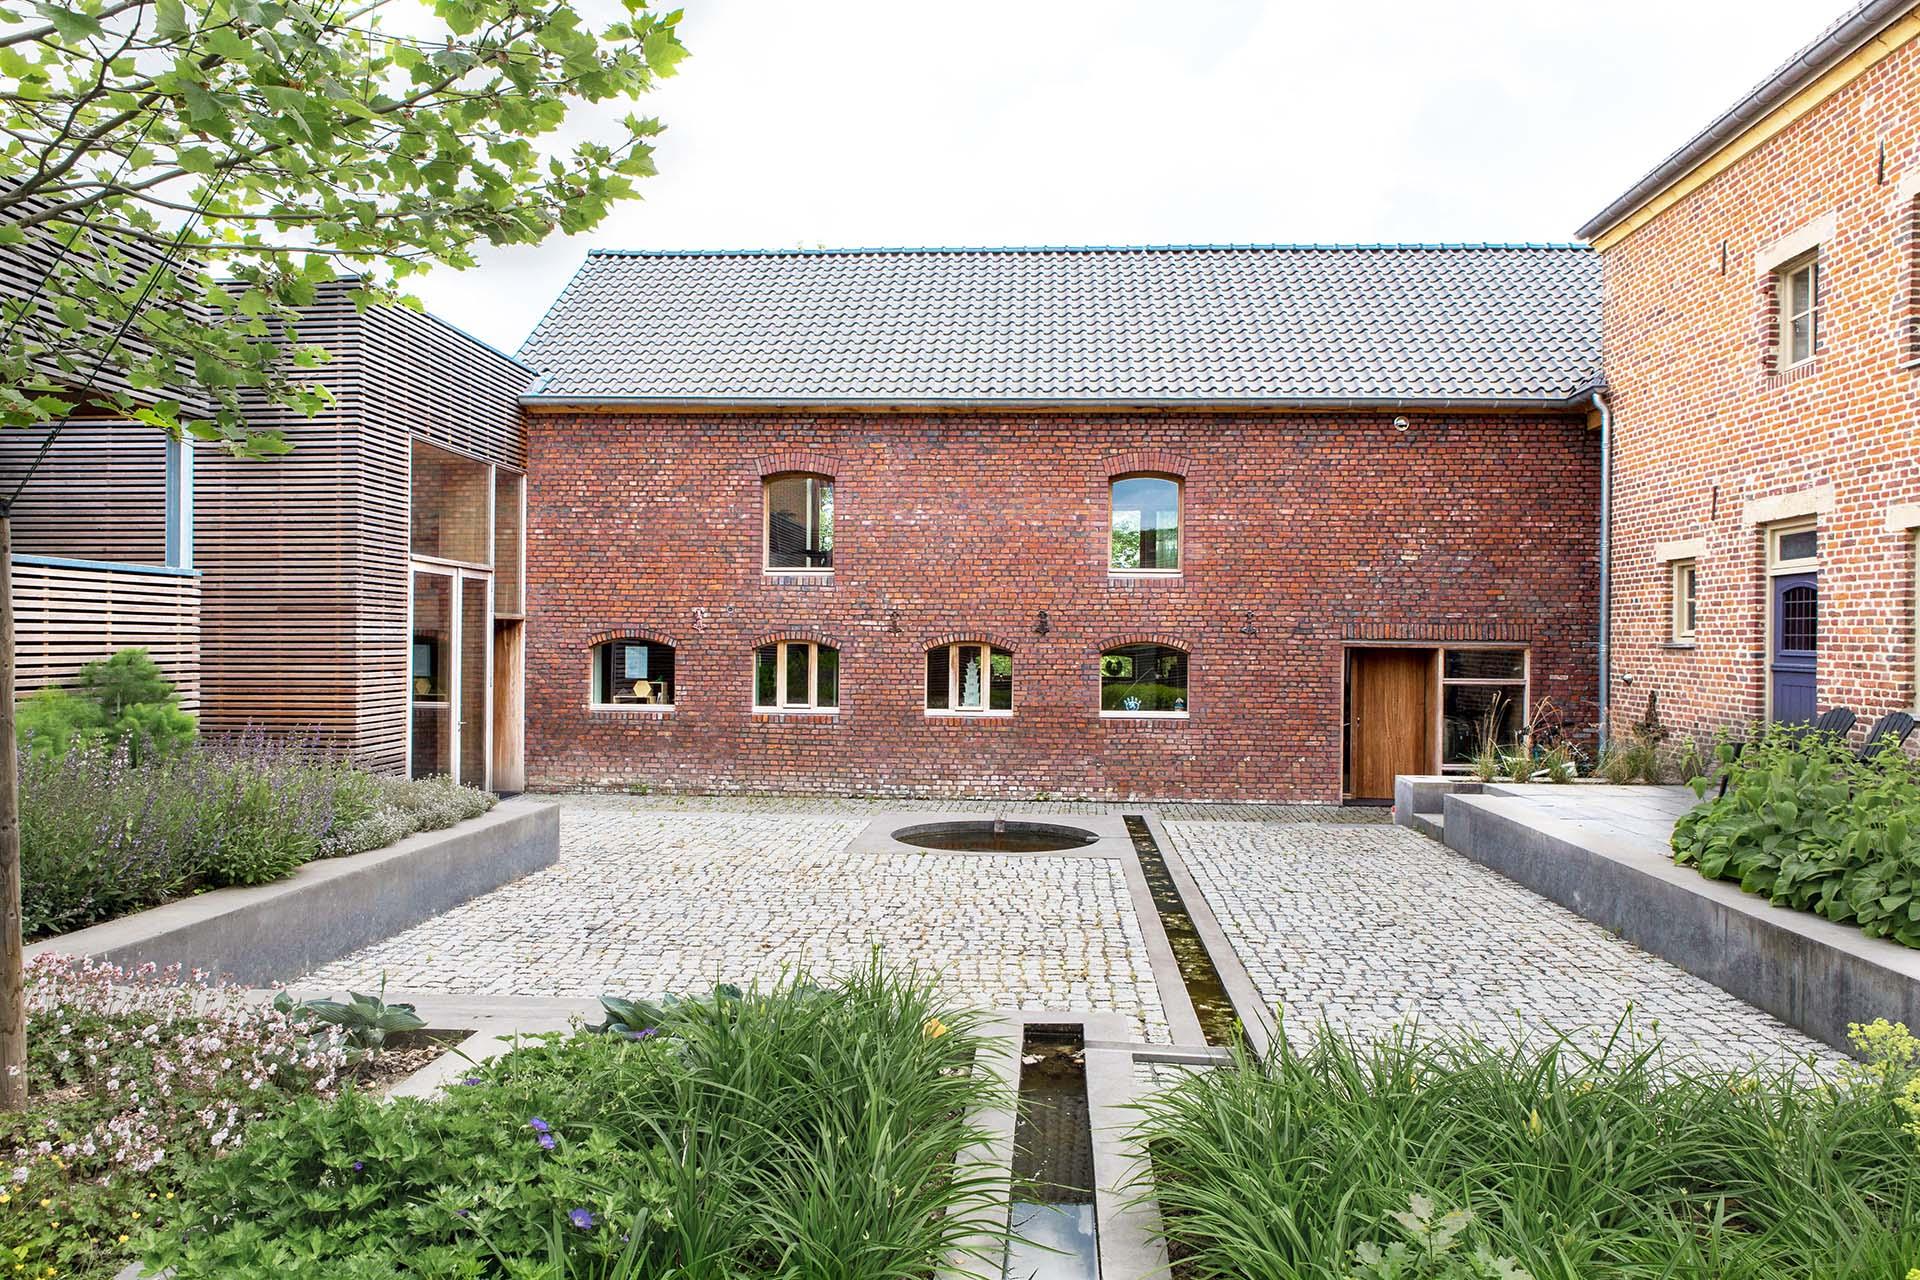 woonhuis boerderij bouwen kopen binnenplaats fontijn kinderkopjes hout baksteen huis